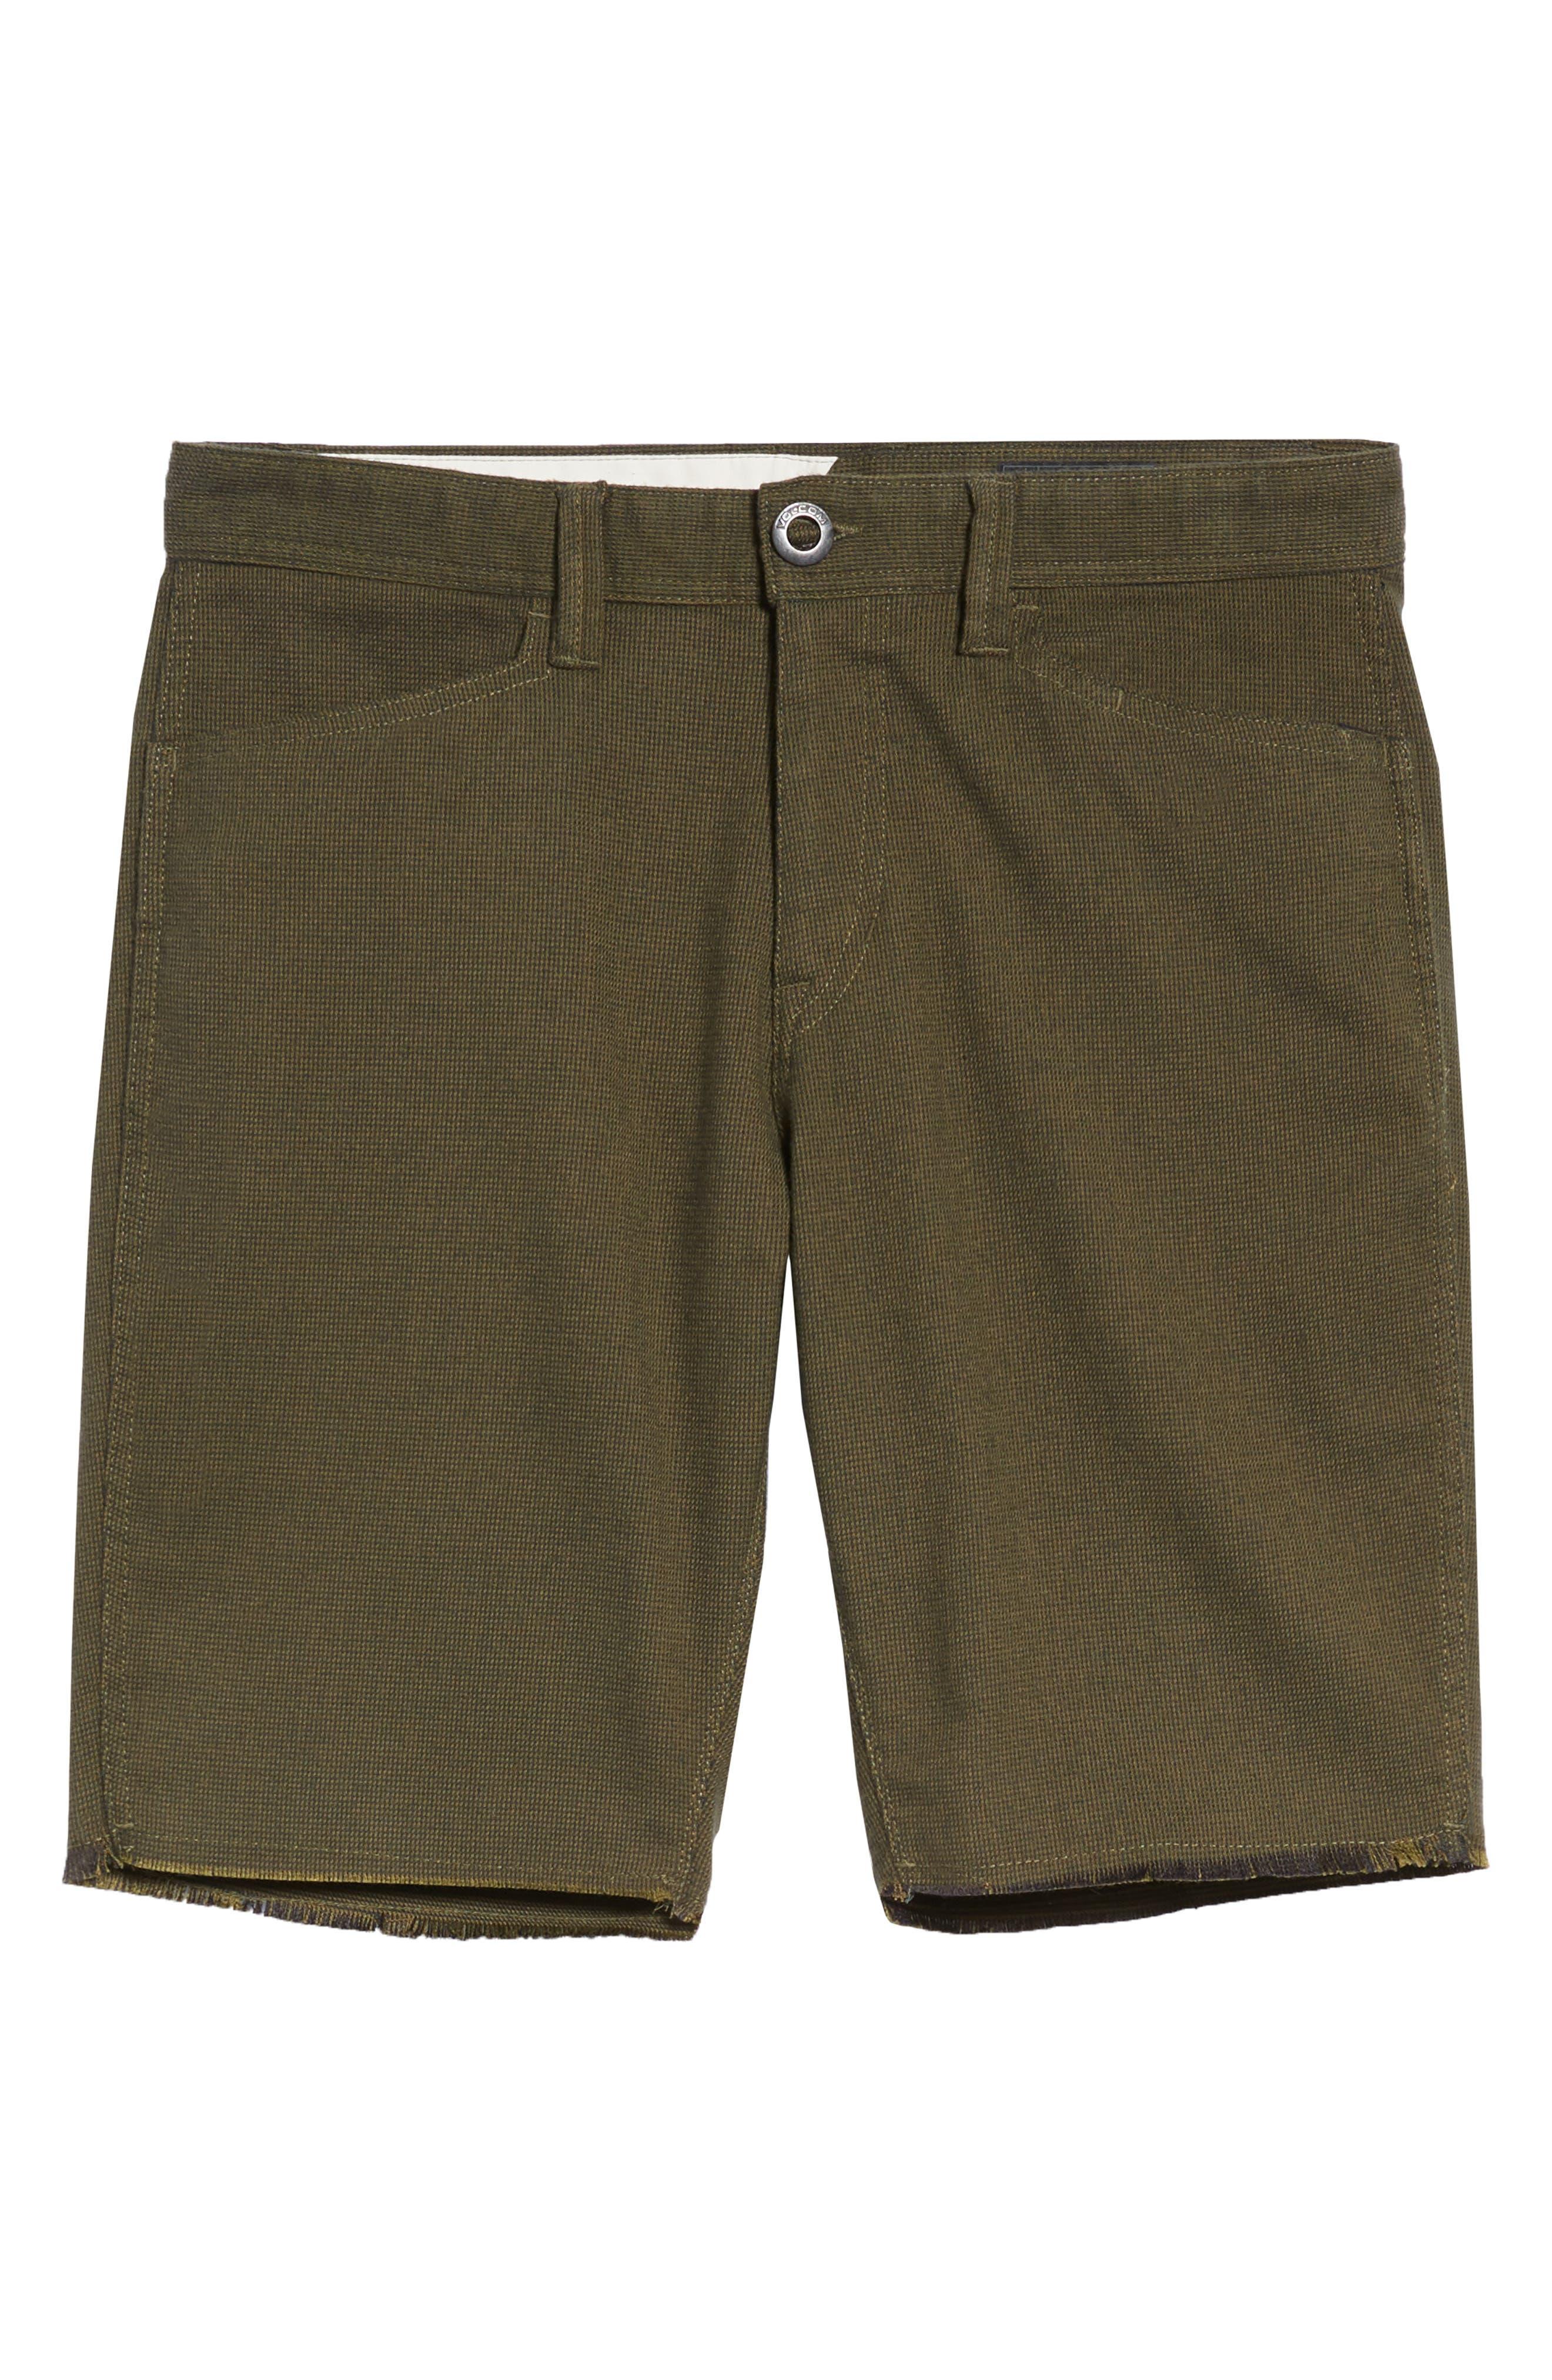 Gritter Thrifter Shorts,                             Alternate thumbnail 6, color,                             GREENTEA